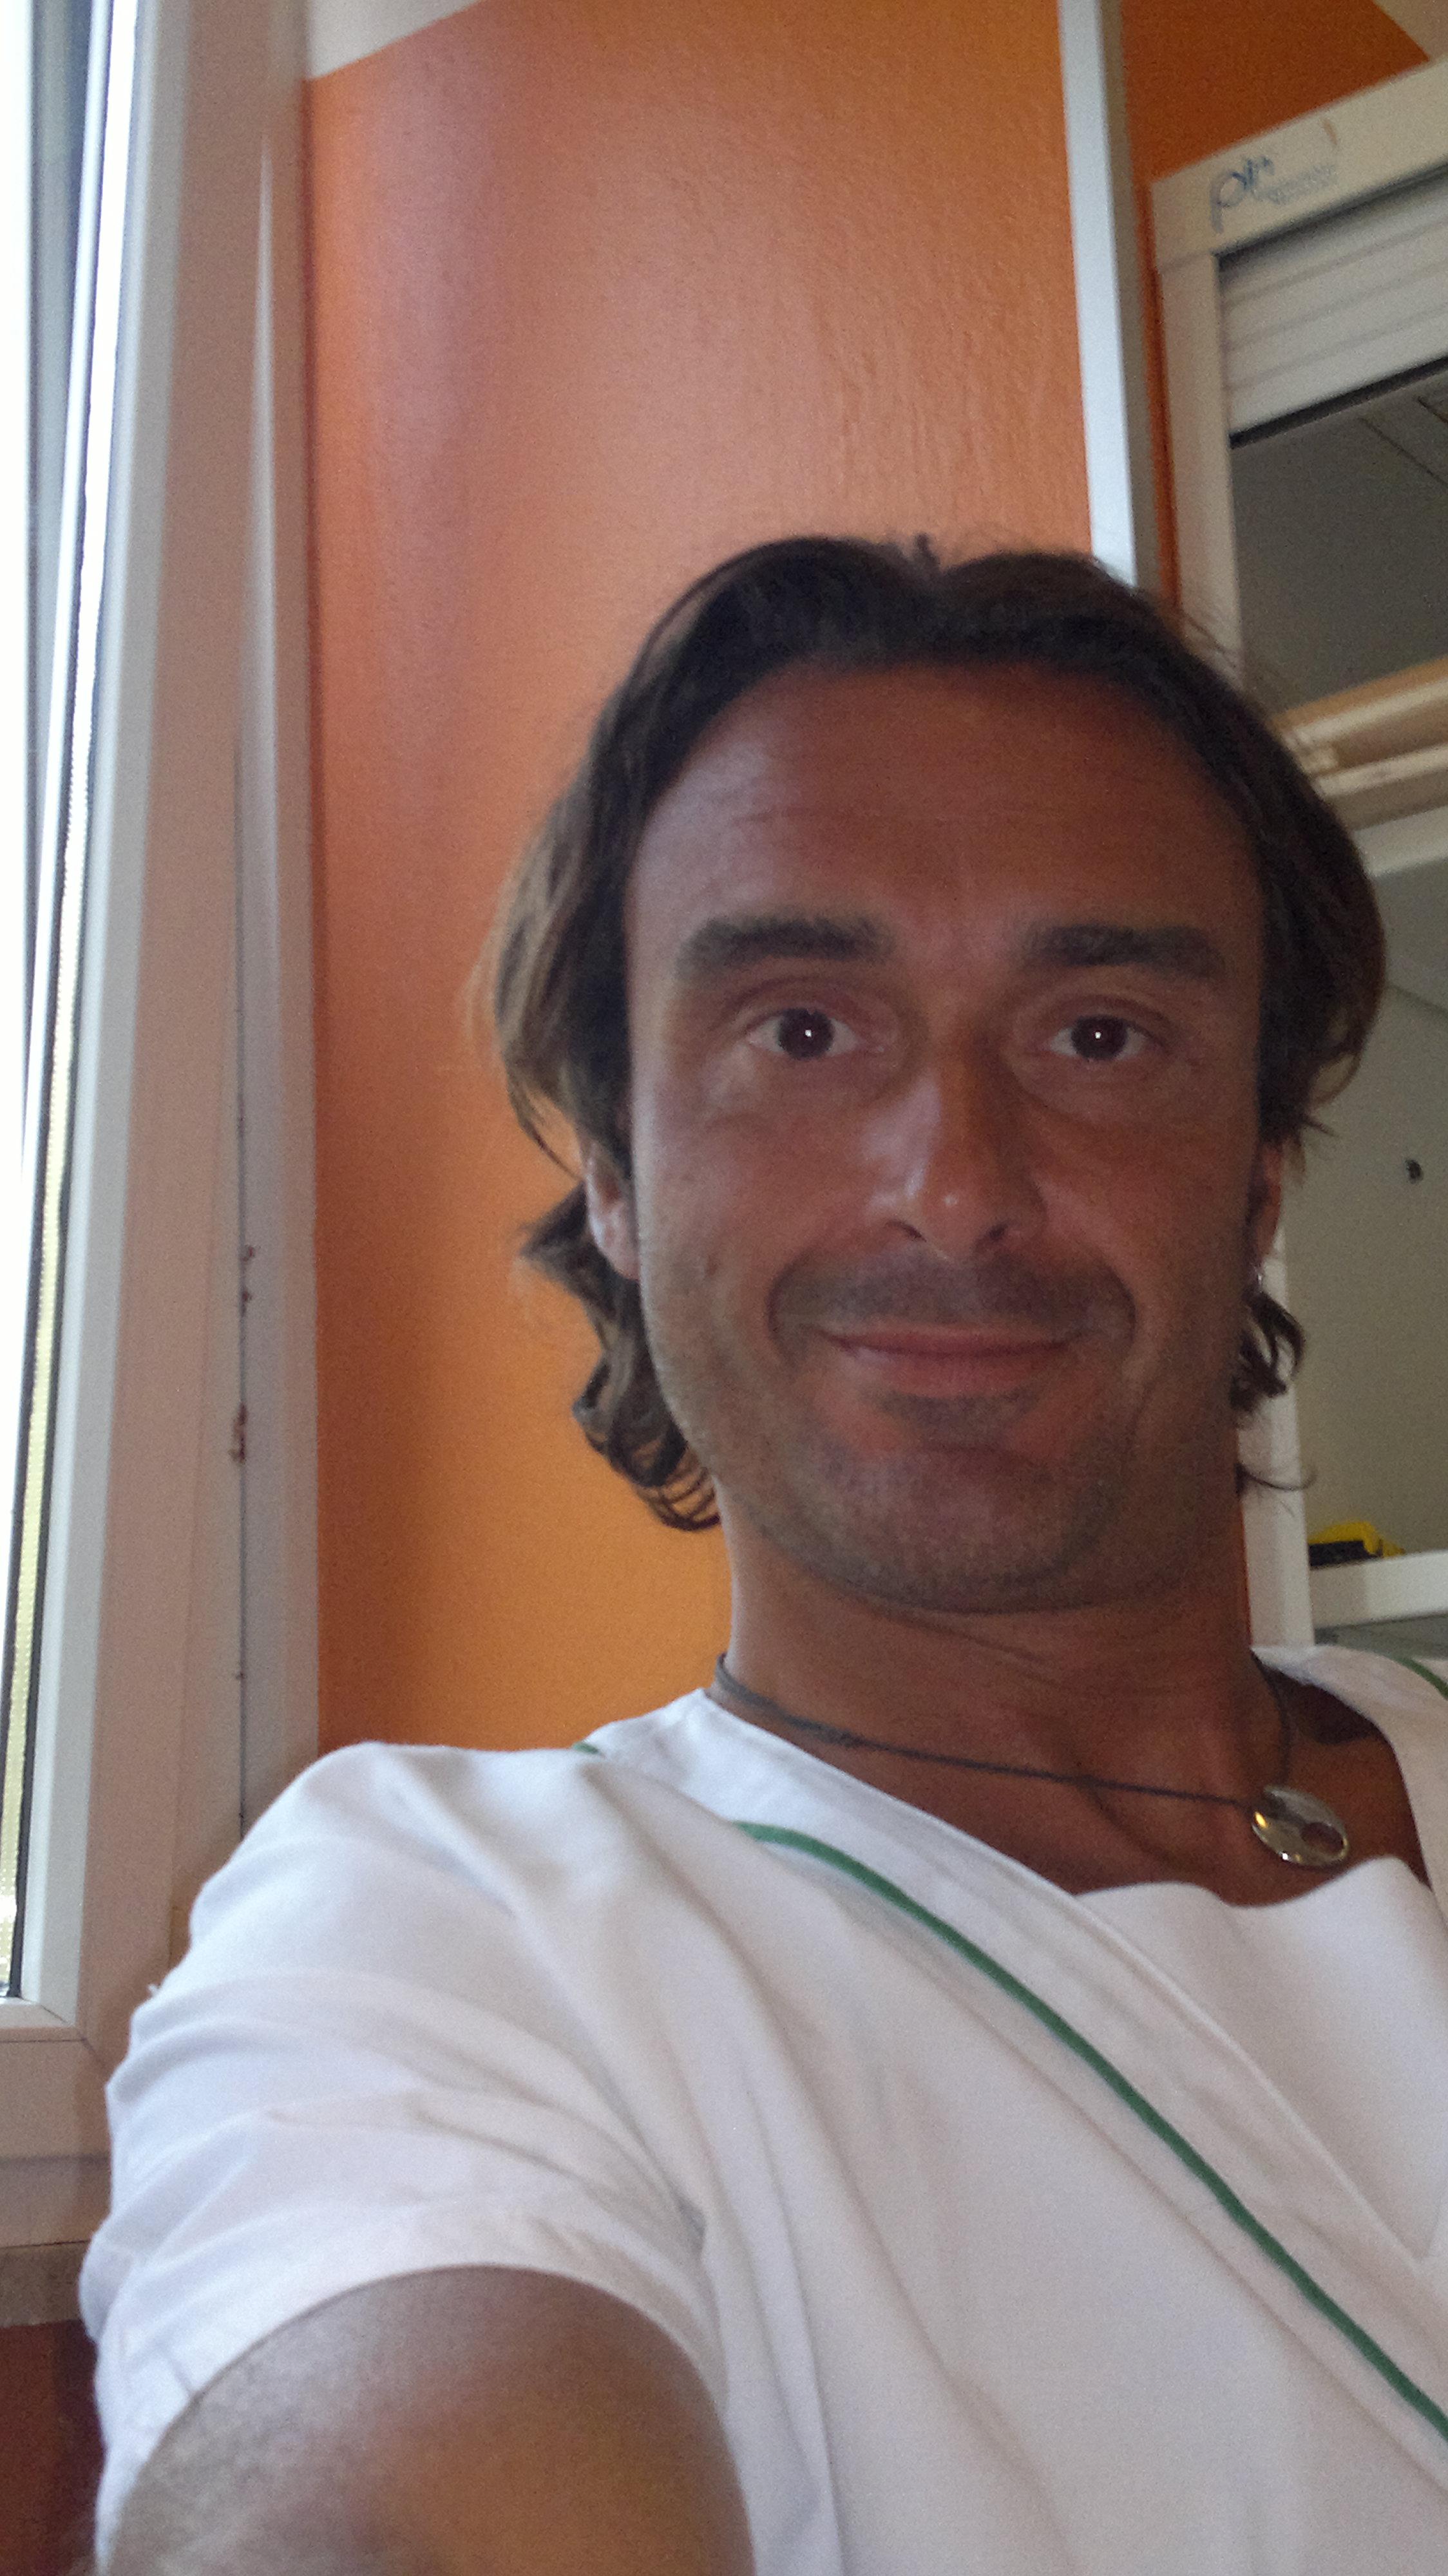 Osteopata Daniele Baldiera